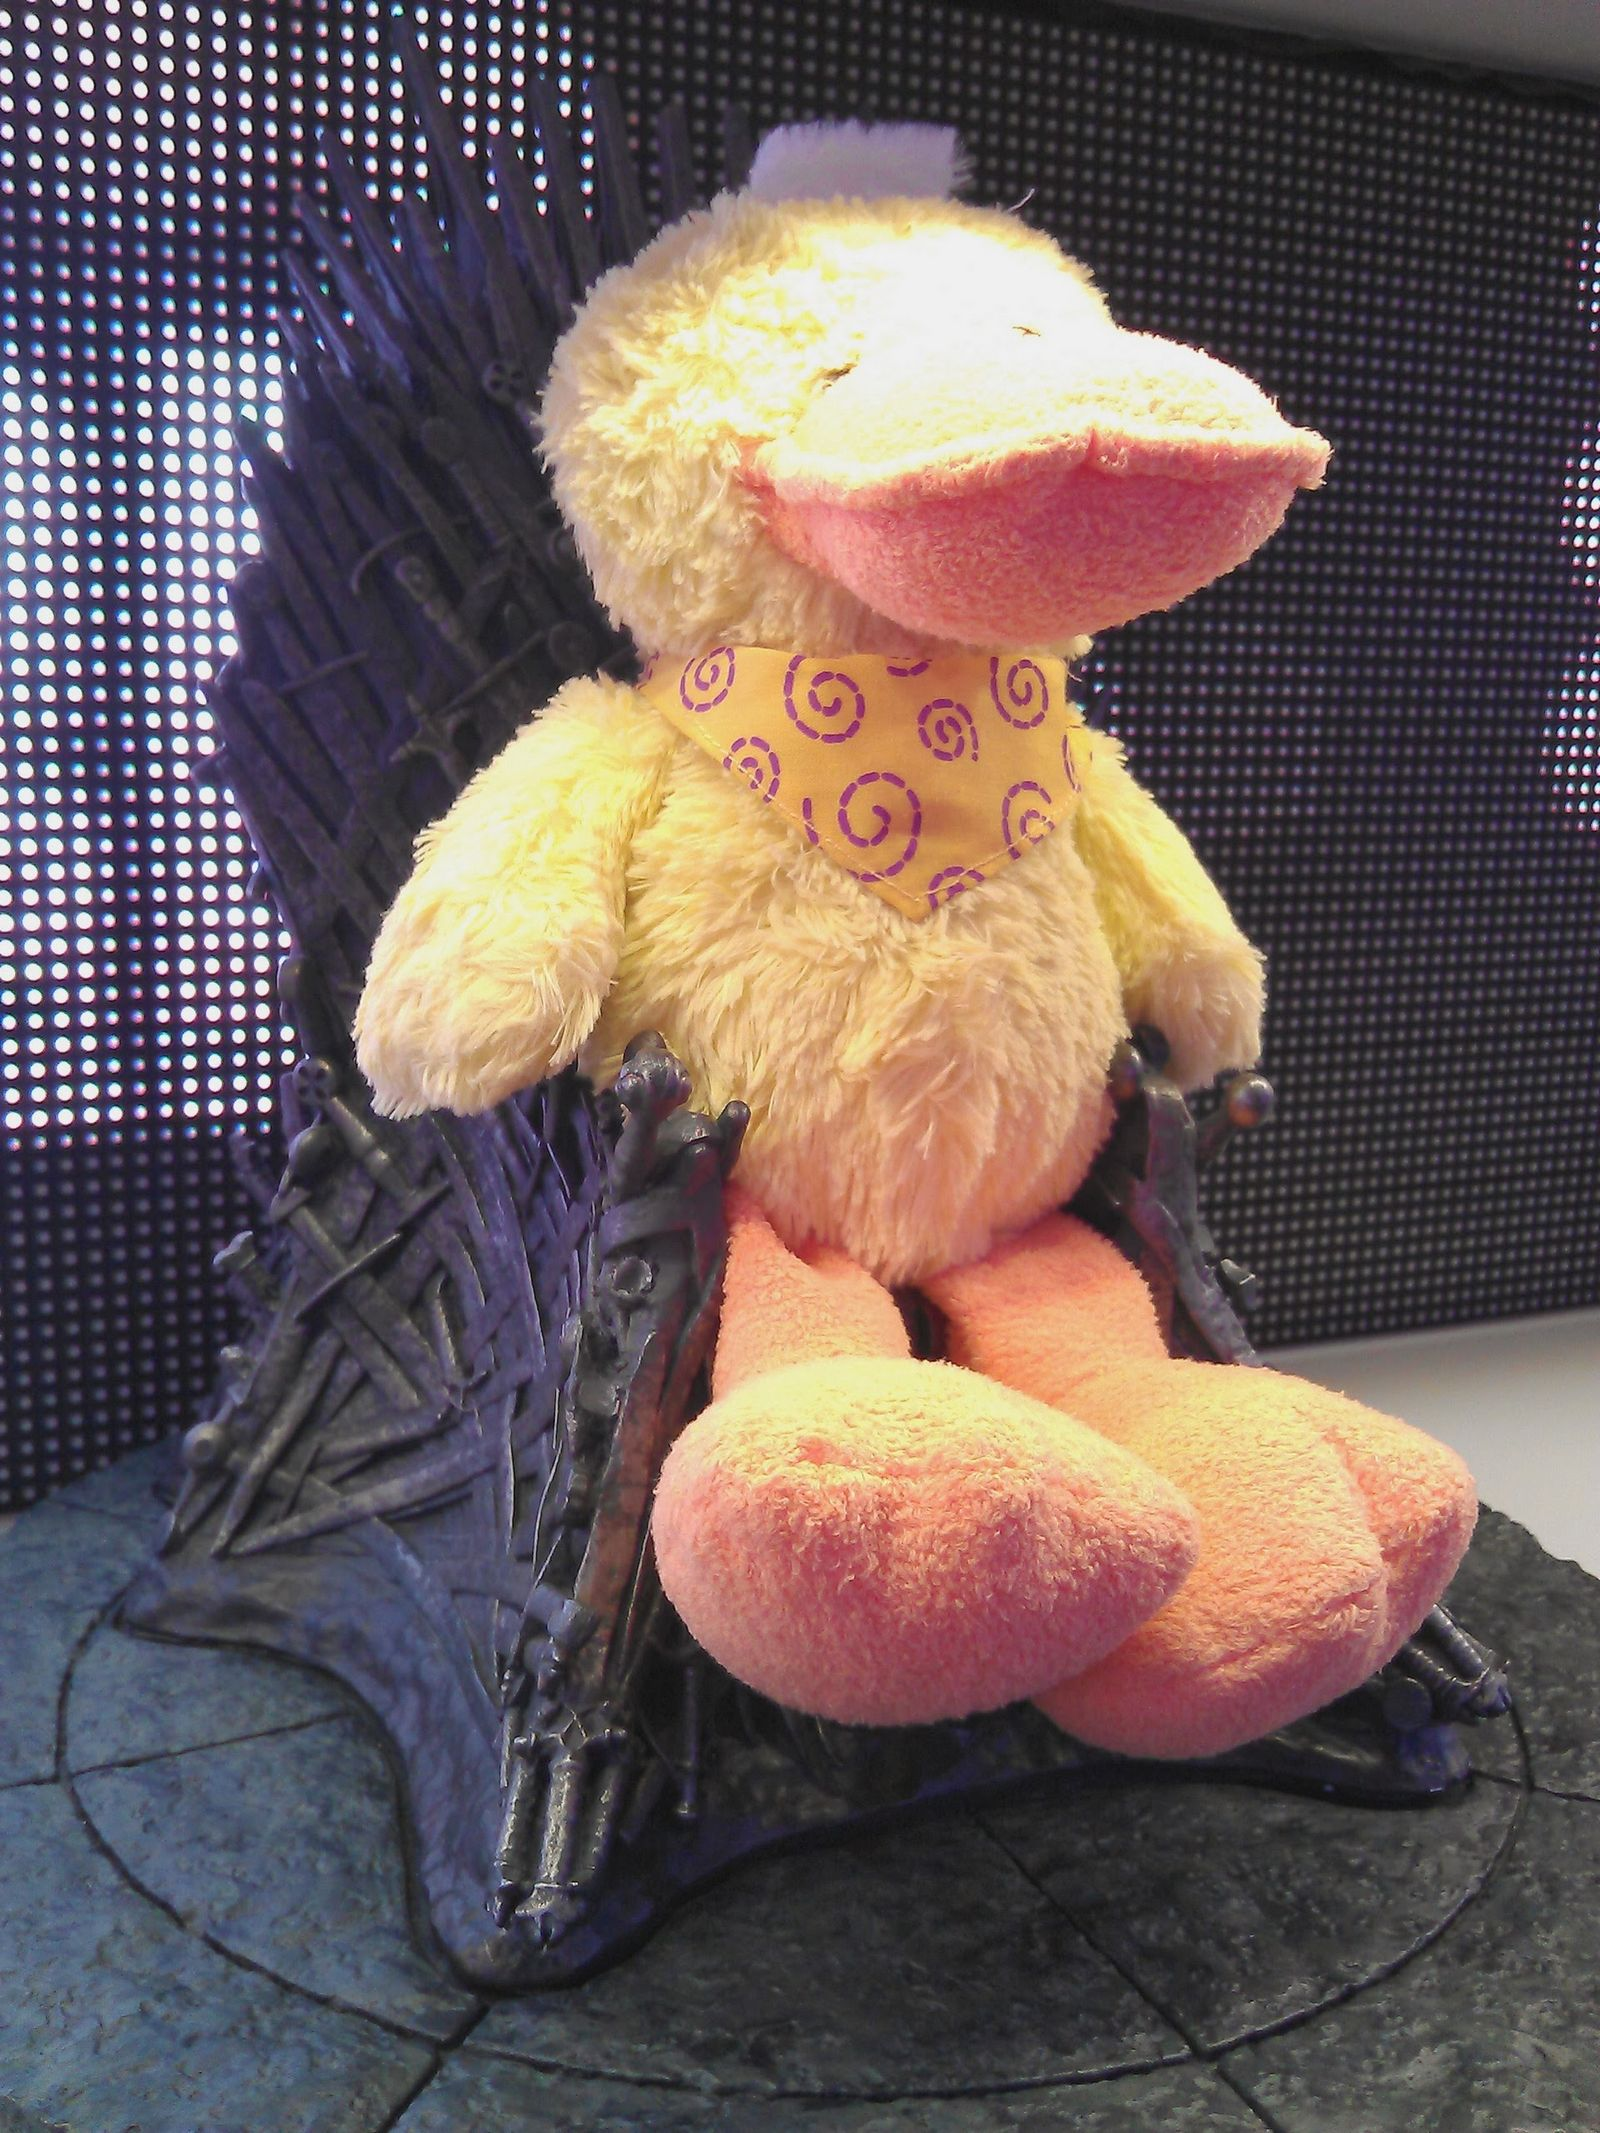 Pato Targaryen, The Duck King